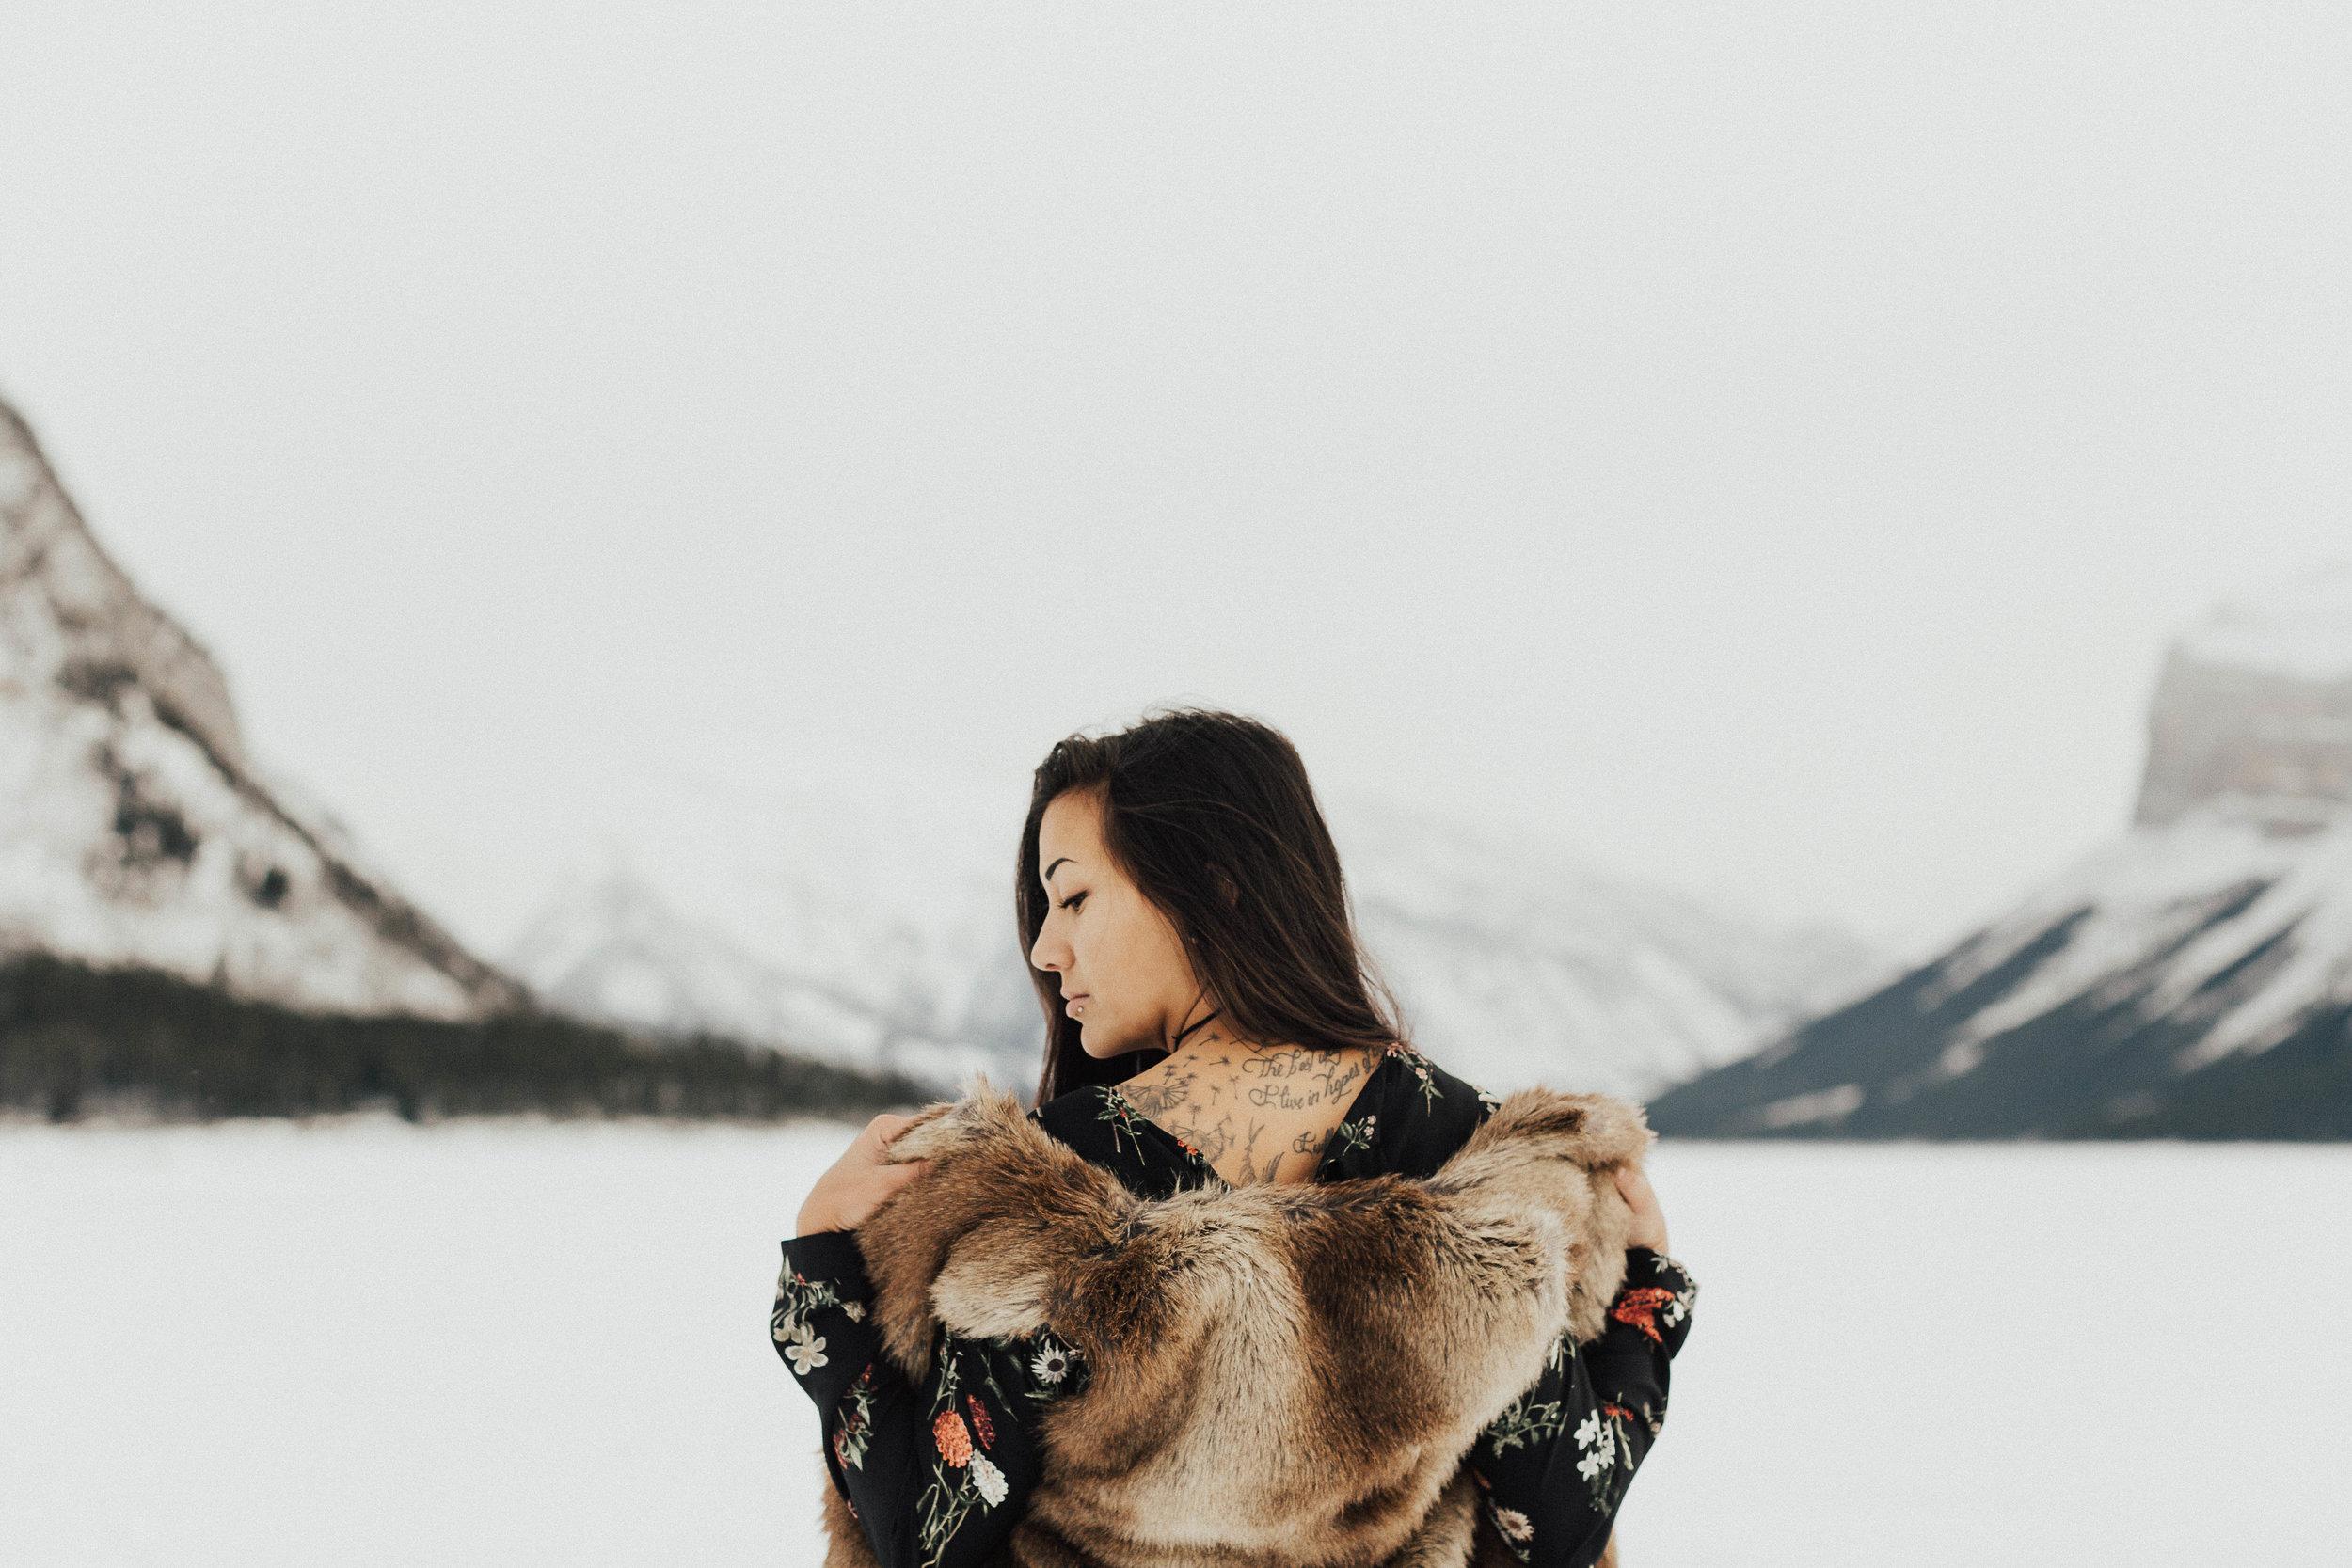 Banff Engagement Photographer - Winter Mountain Adventure Engagement Session - Michelle Larmand Photography-048